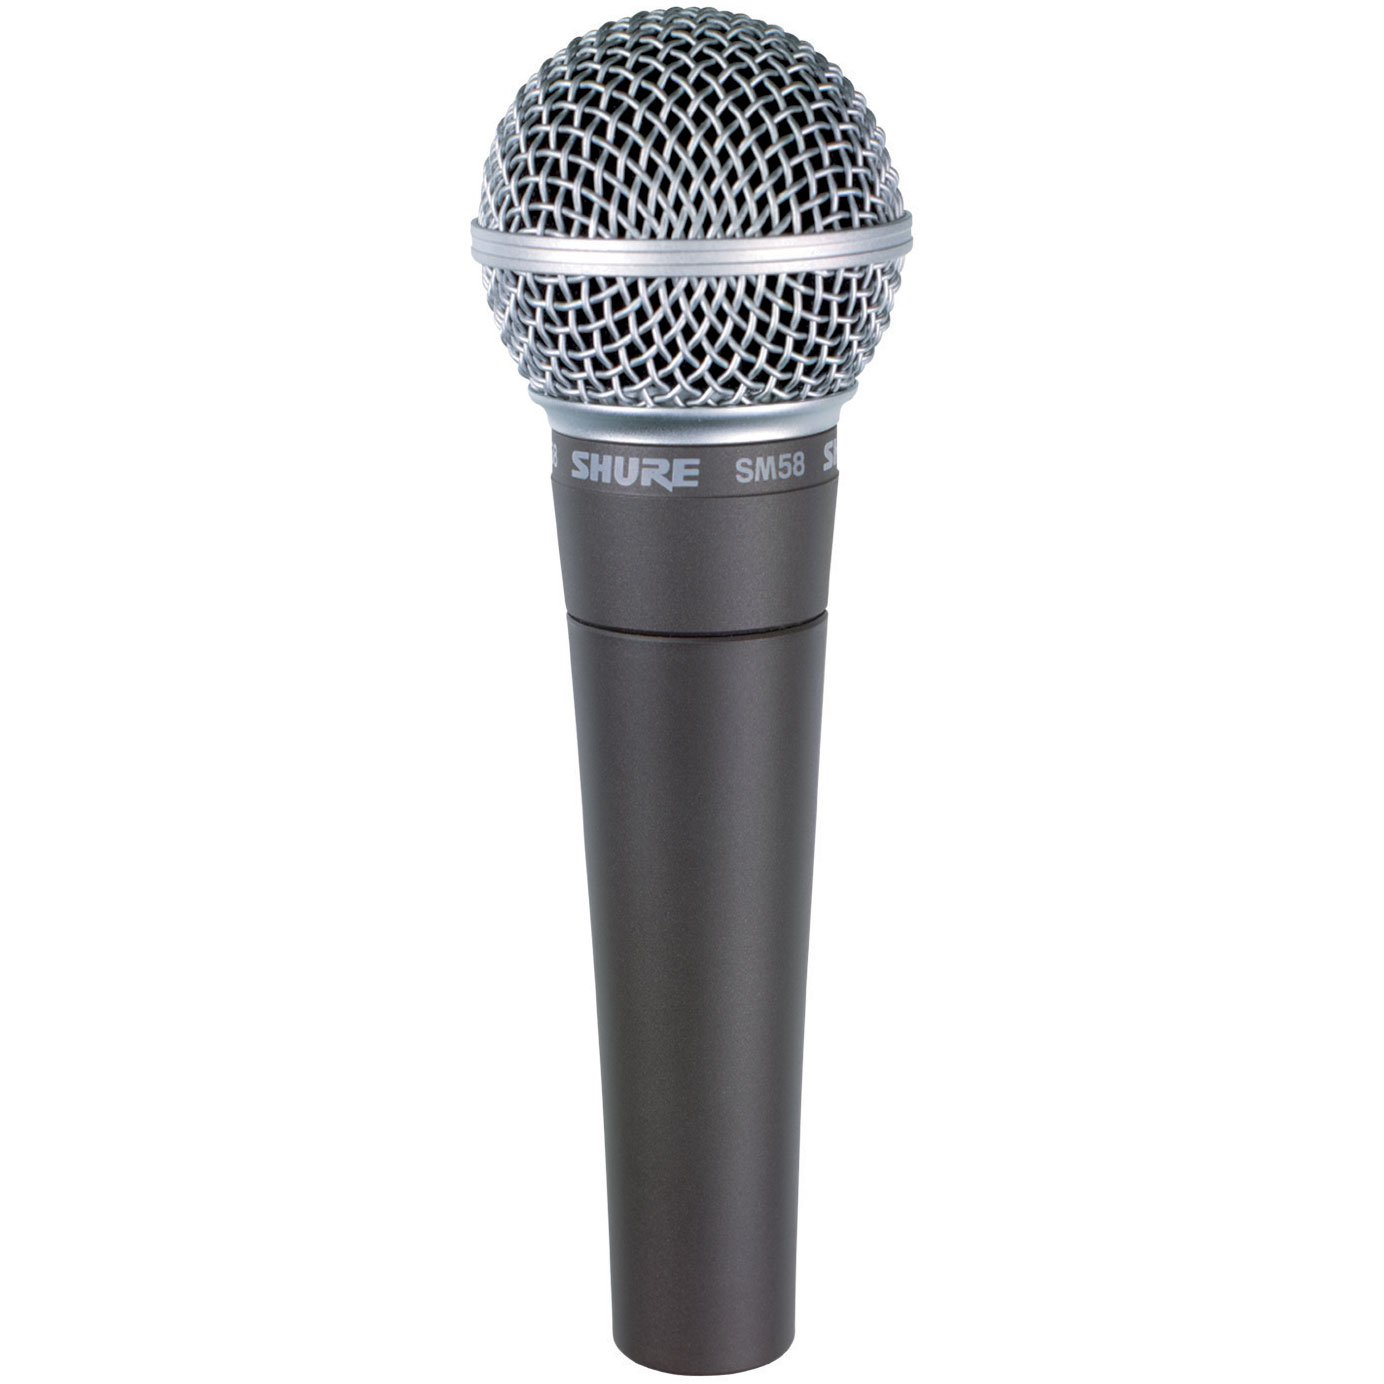 SM58 Cardioid Dynamic Microphone